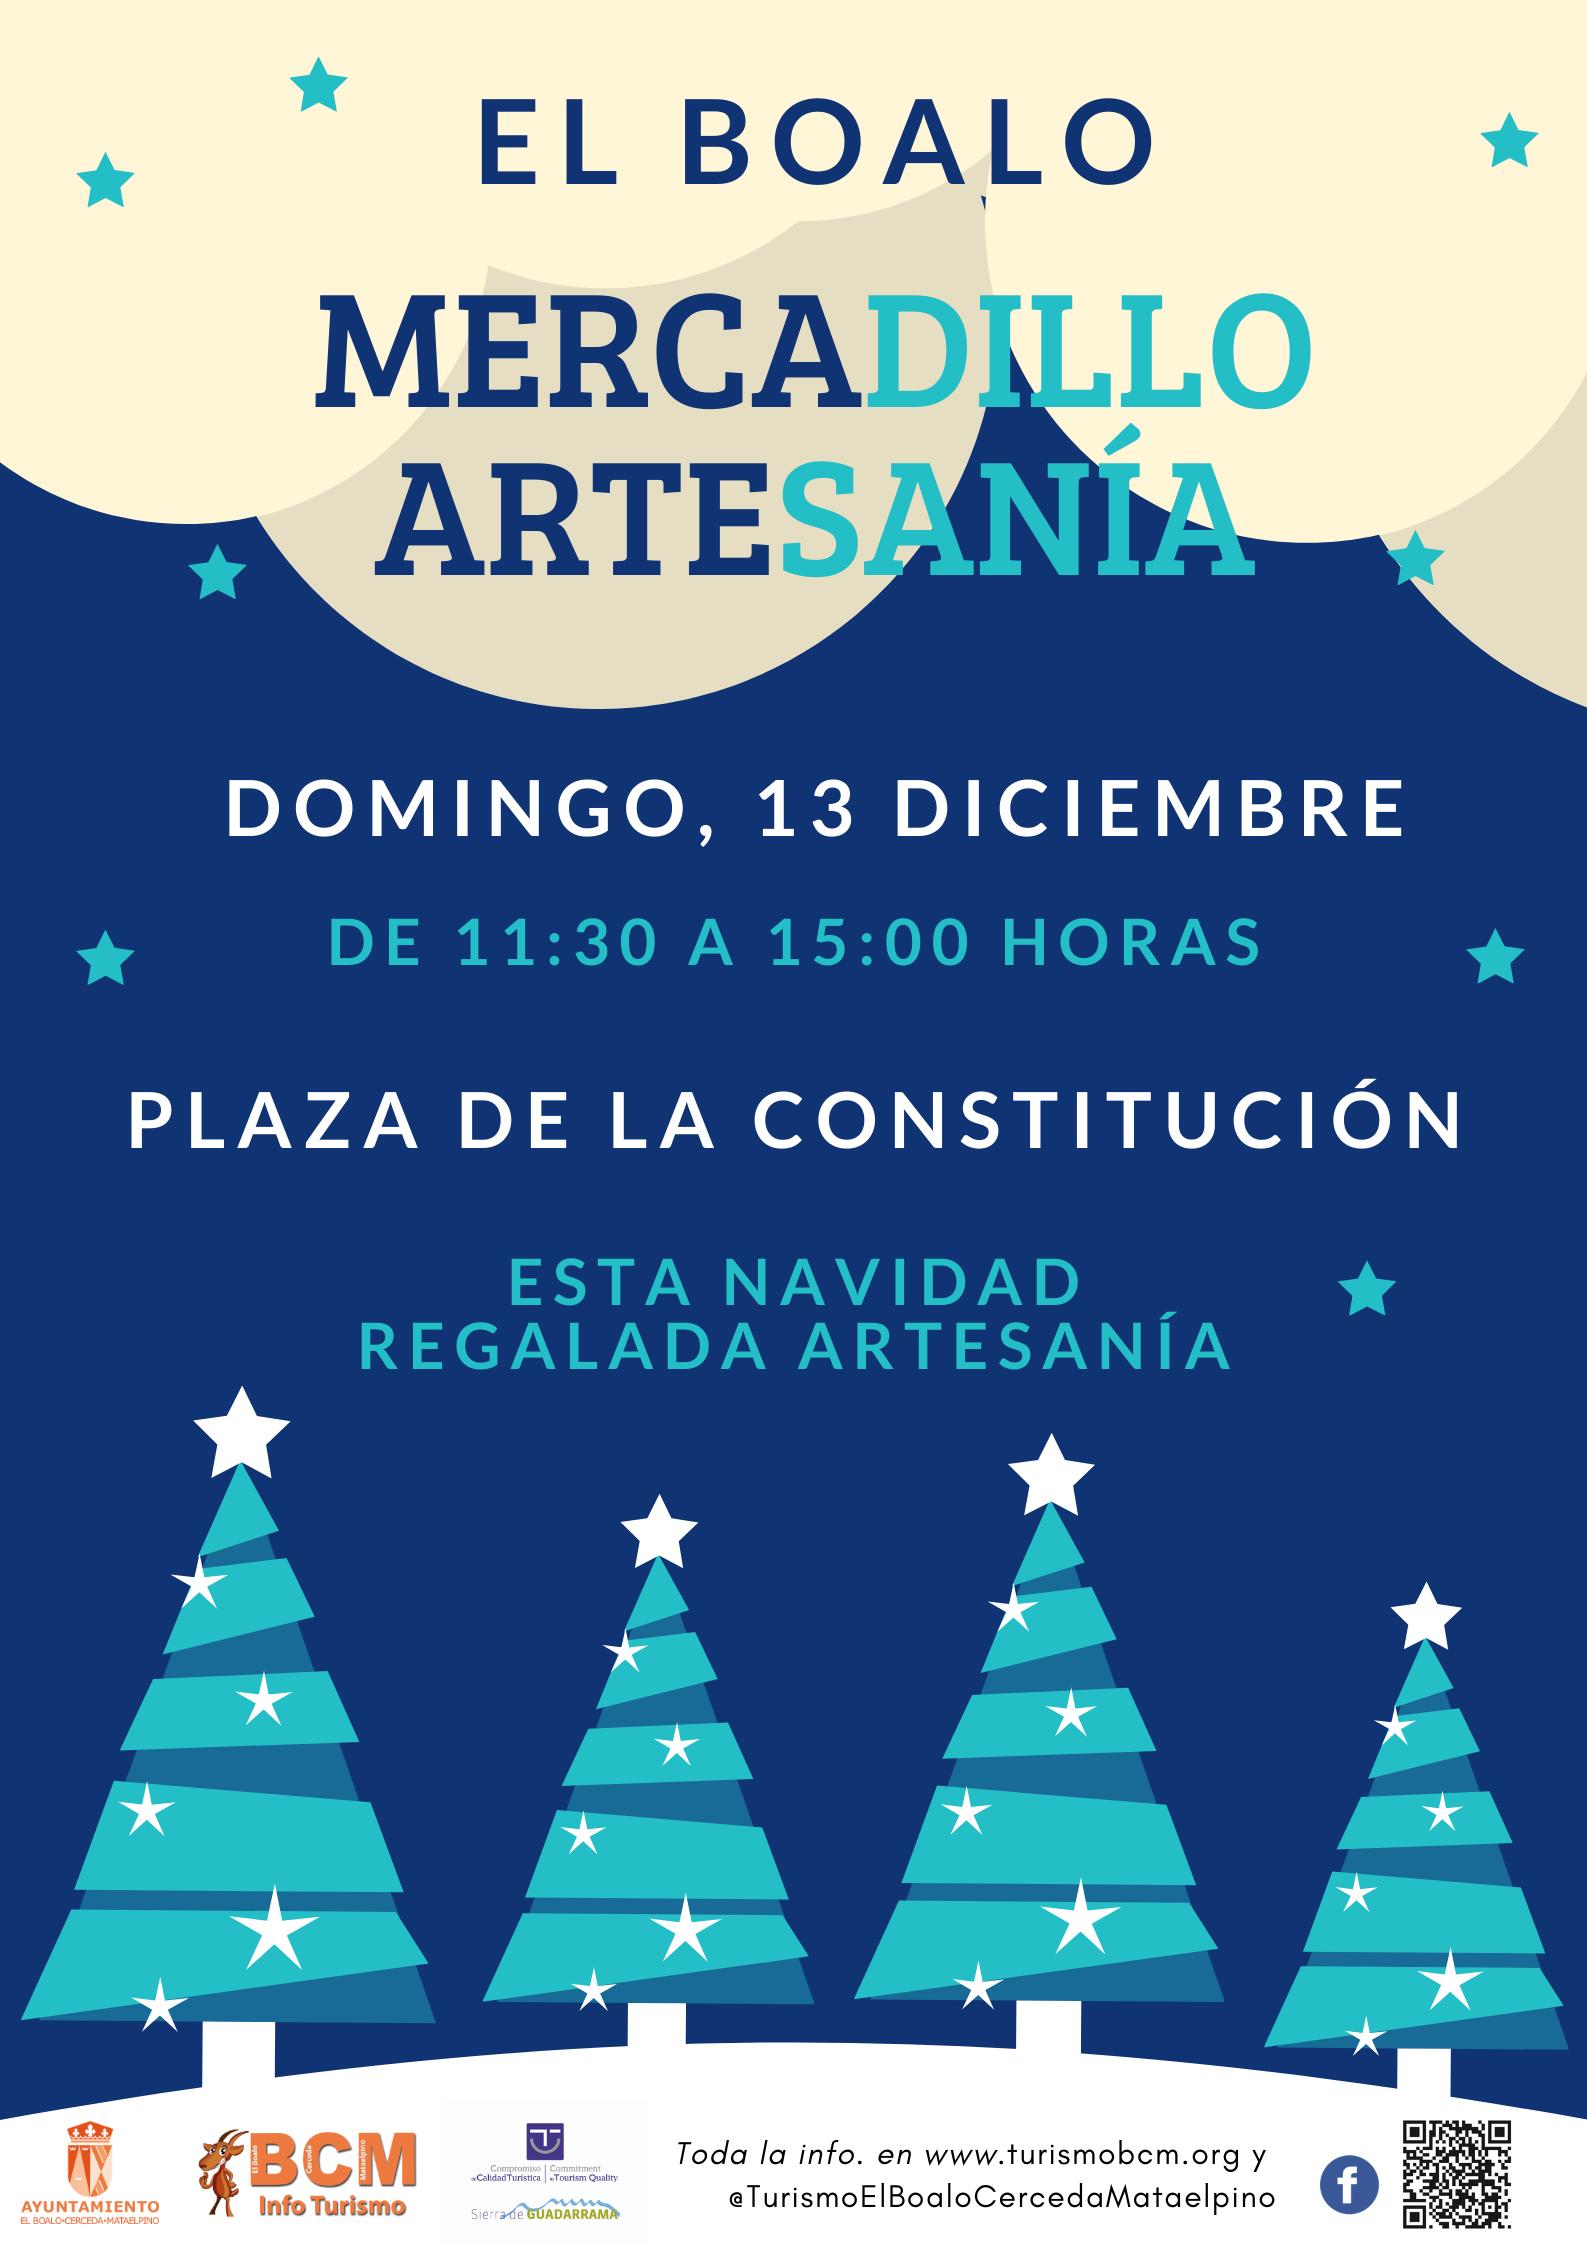 Mercadillo Artesania 13diciembreBoalo